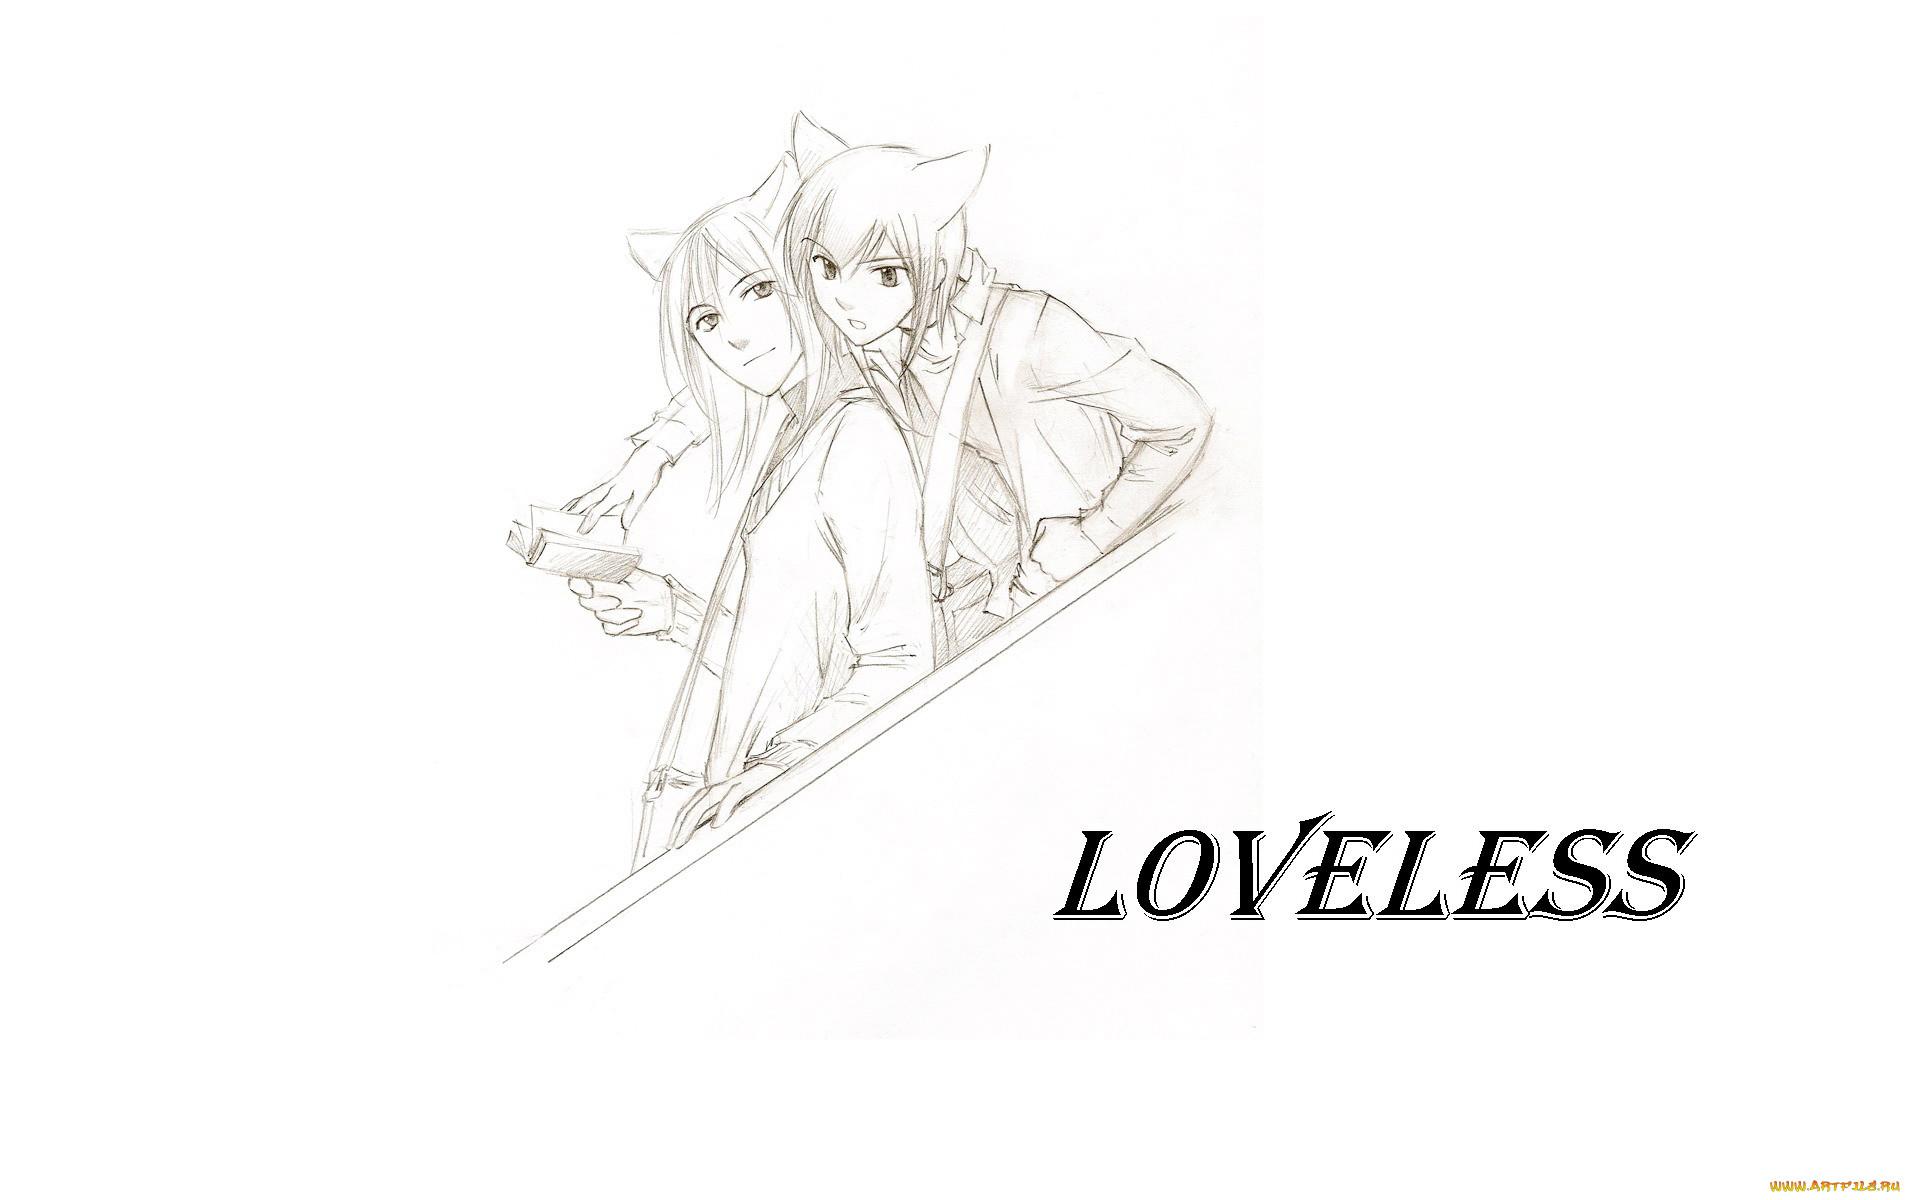 аниме, loveless, нелюбимые, лестница, книга, рицка, агатсума, соби